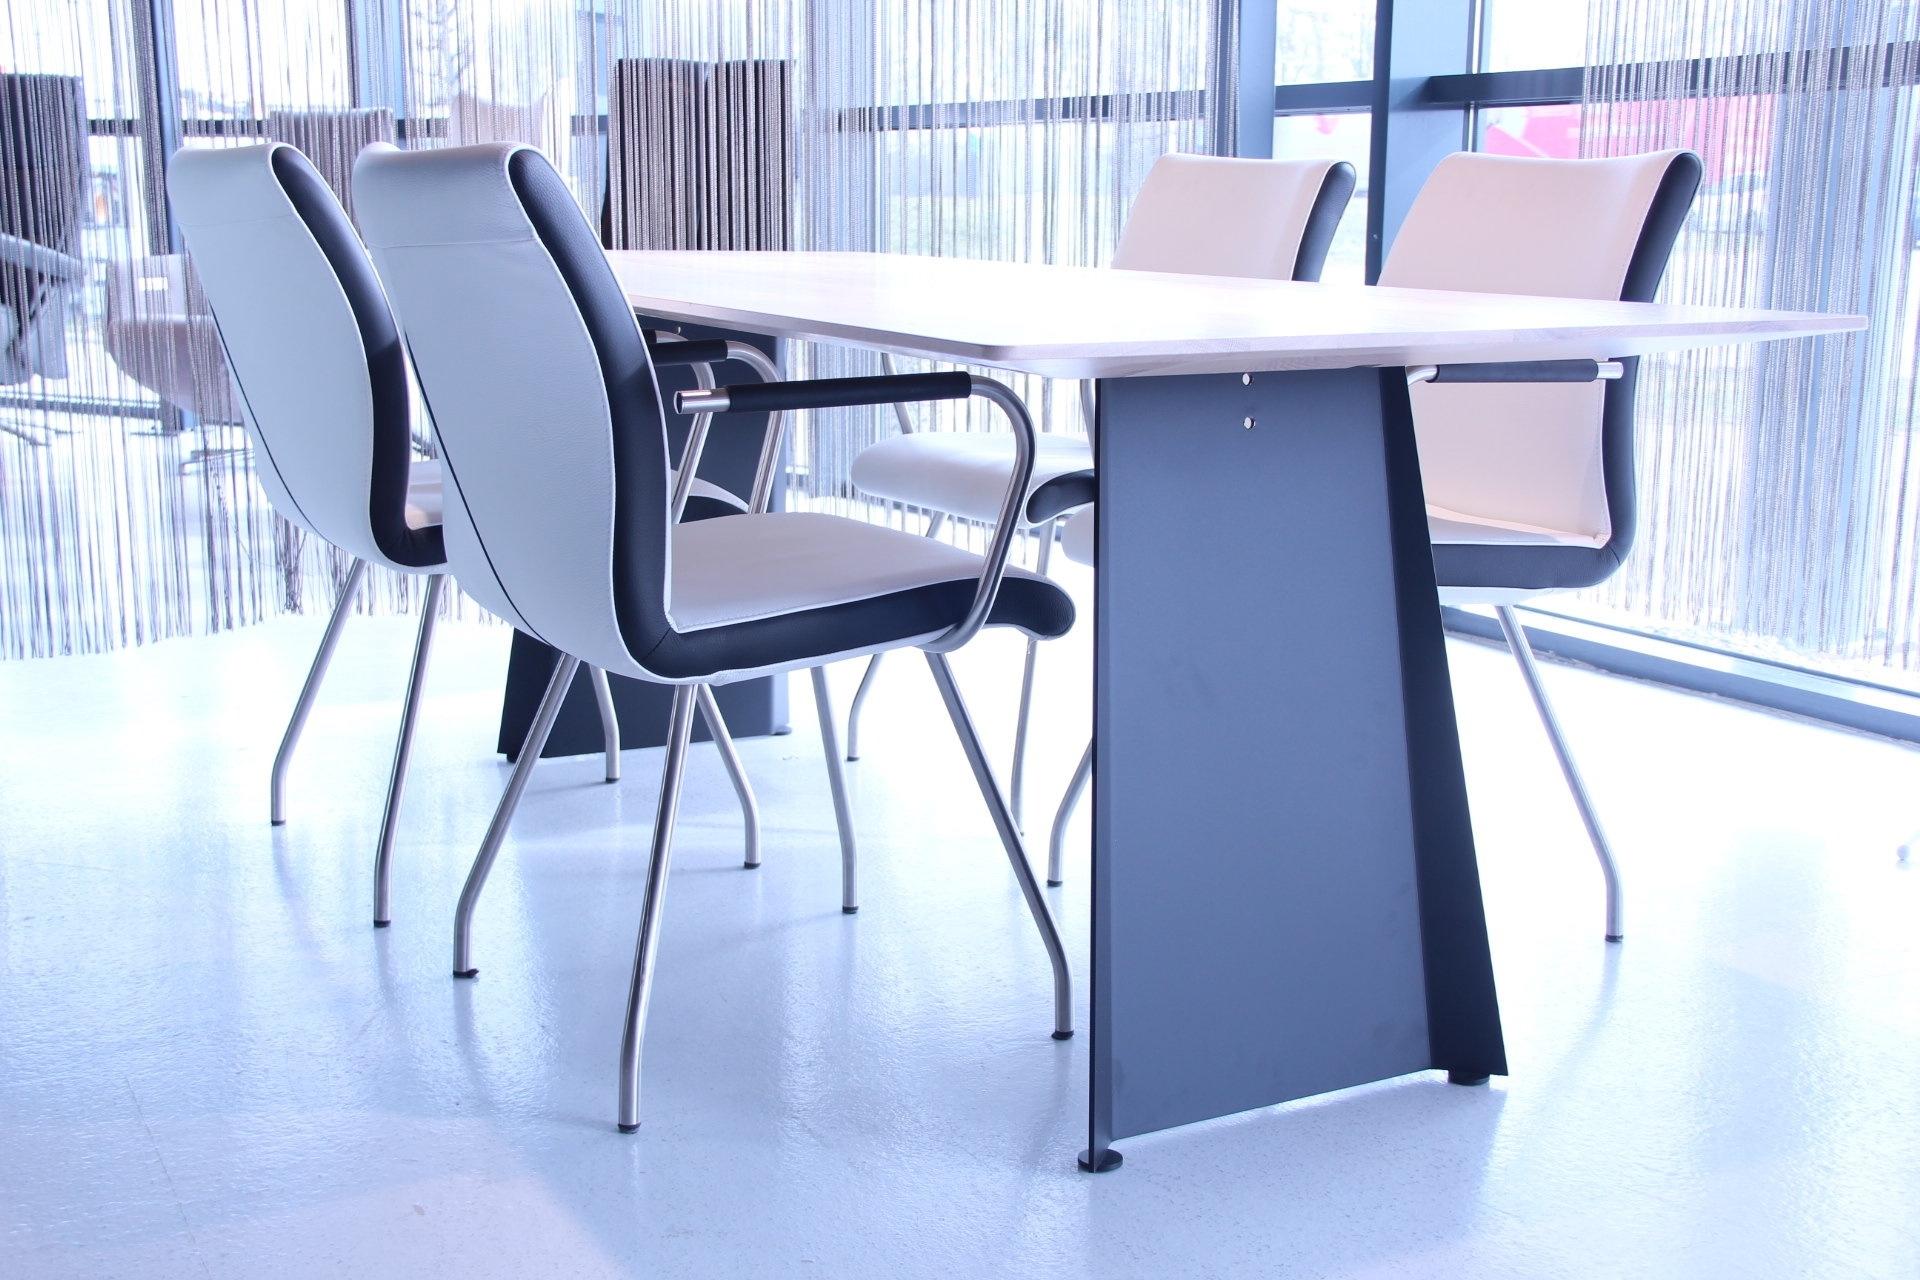 4 x eetkamerstoel shine leder wit met zwart woonplaza for Eetkamerstoelen outlet design